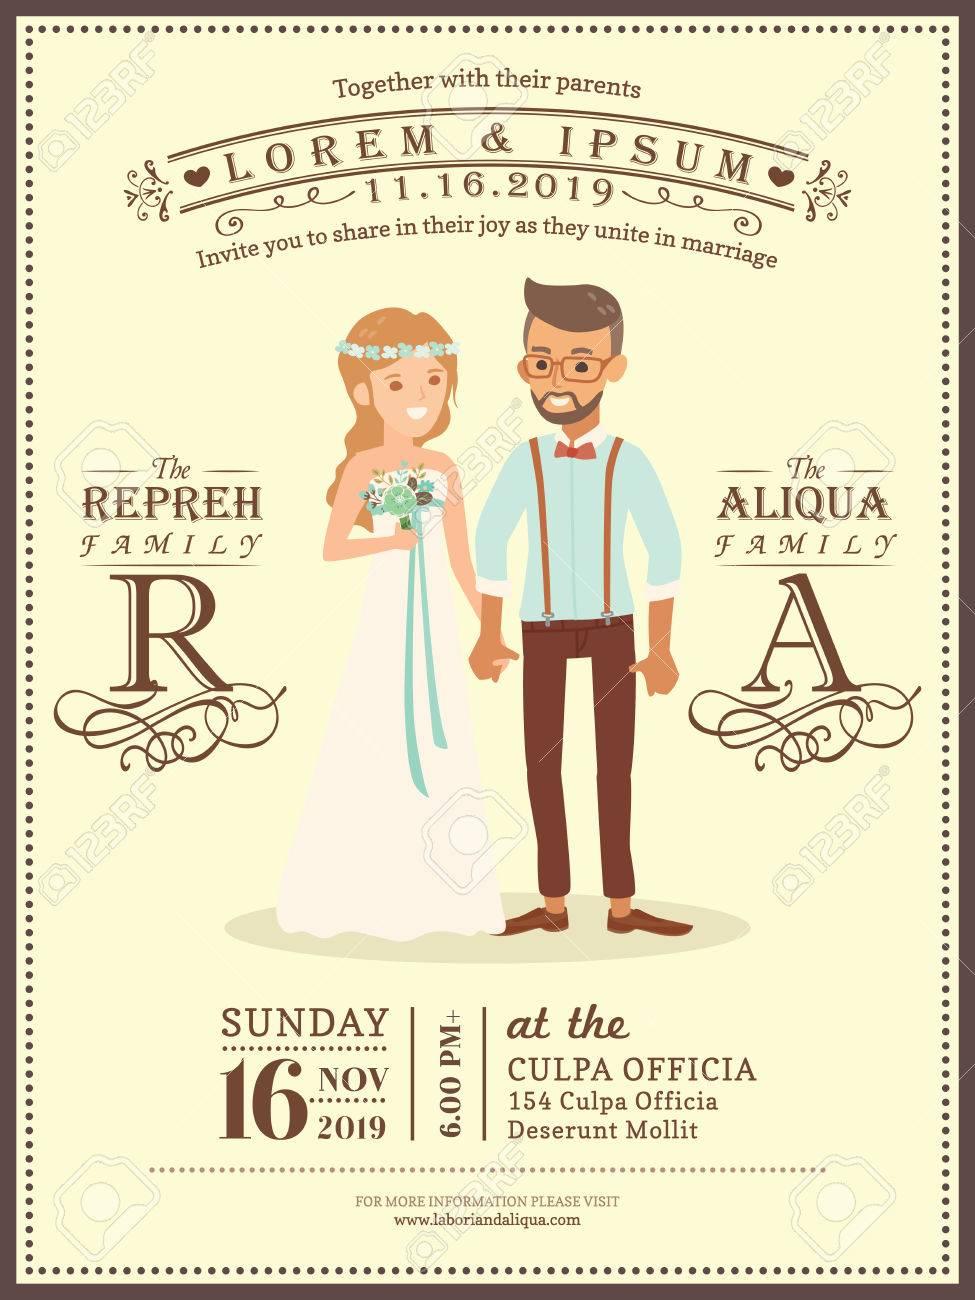 Cute Wedding Couple Groom And Bride Cartoon Wedding Invitation Card  Template Stock Vector   58199299